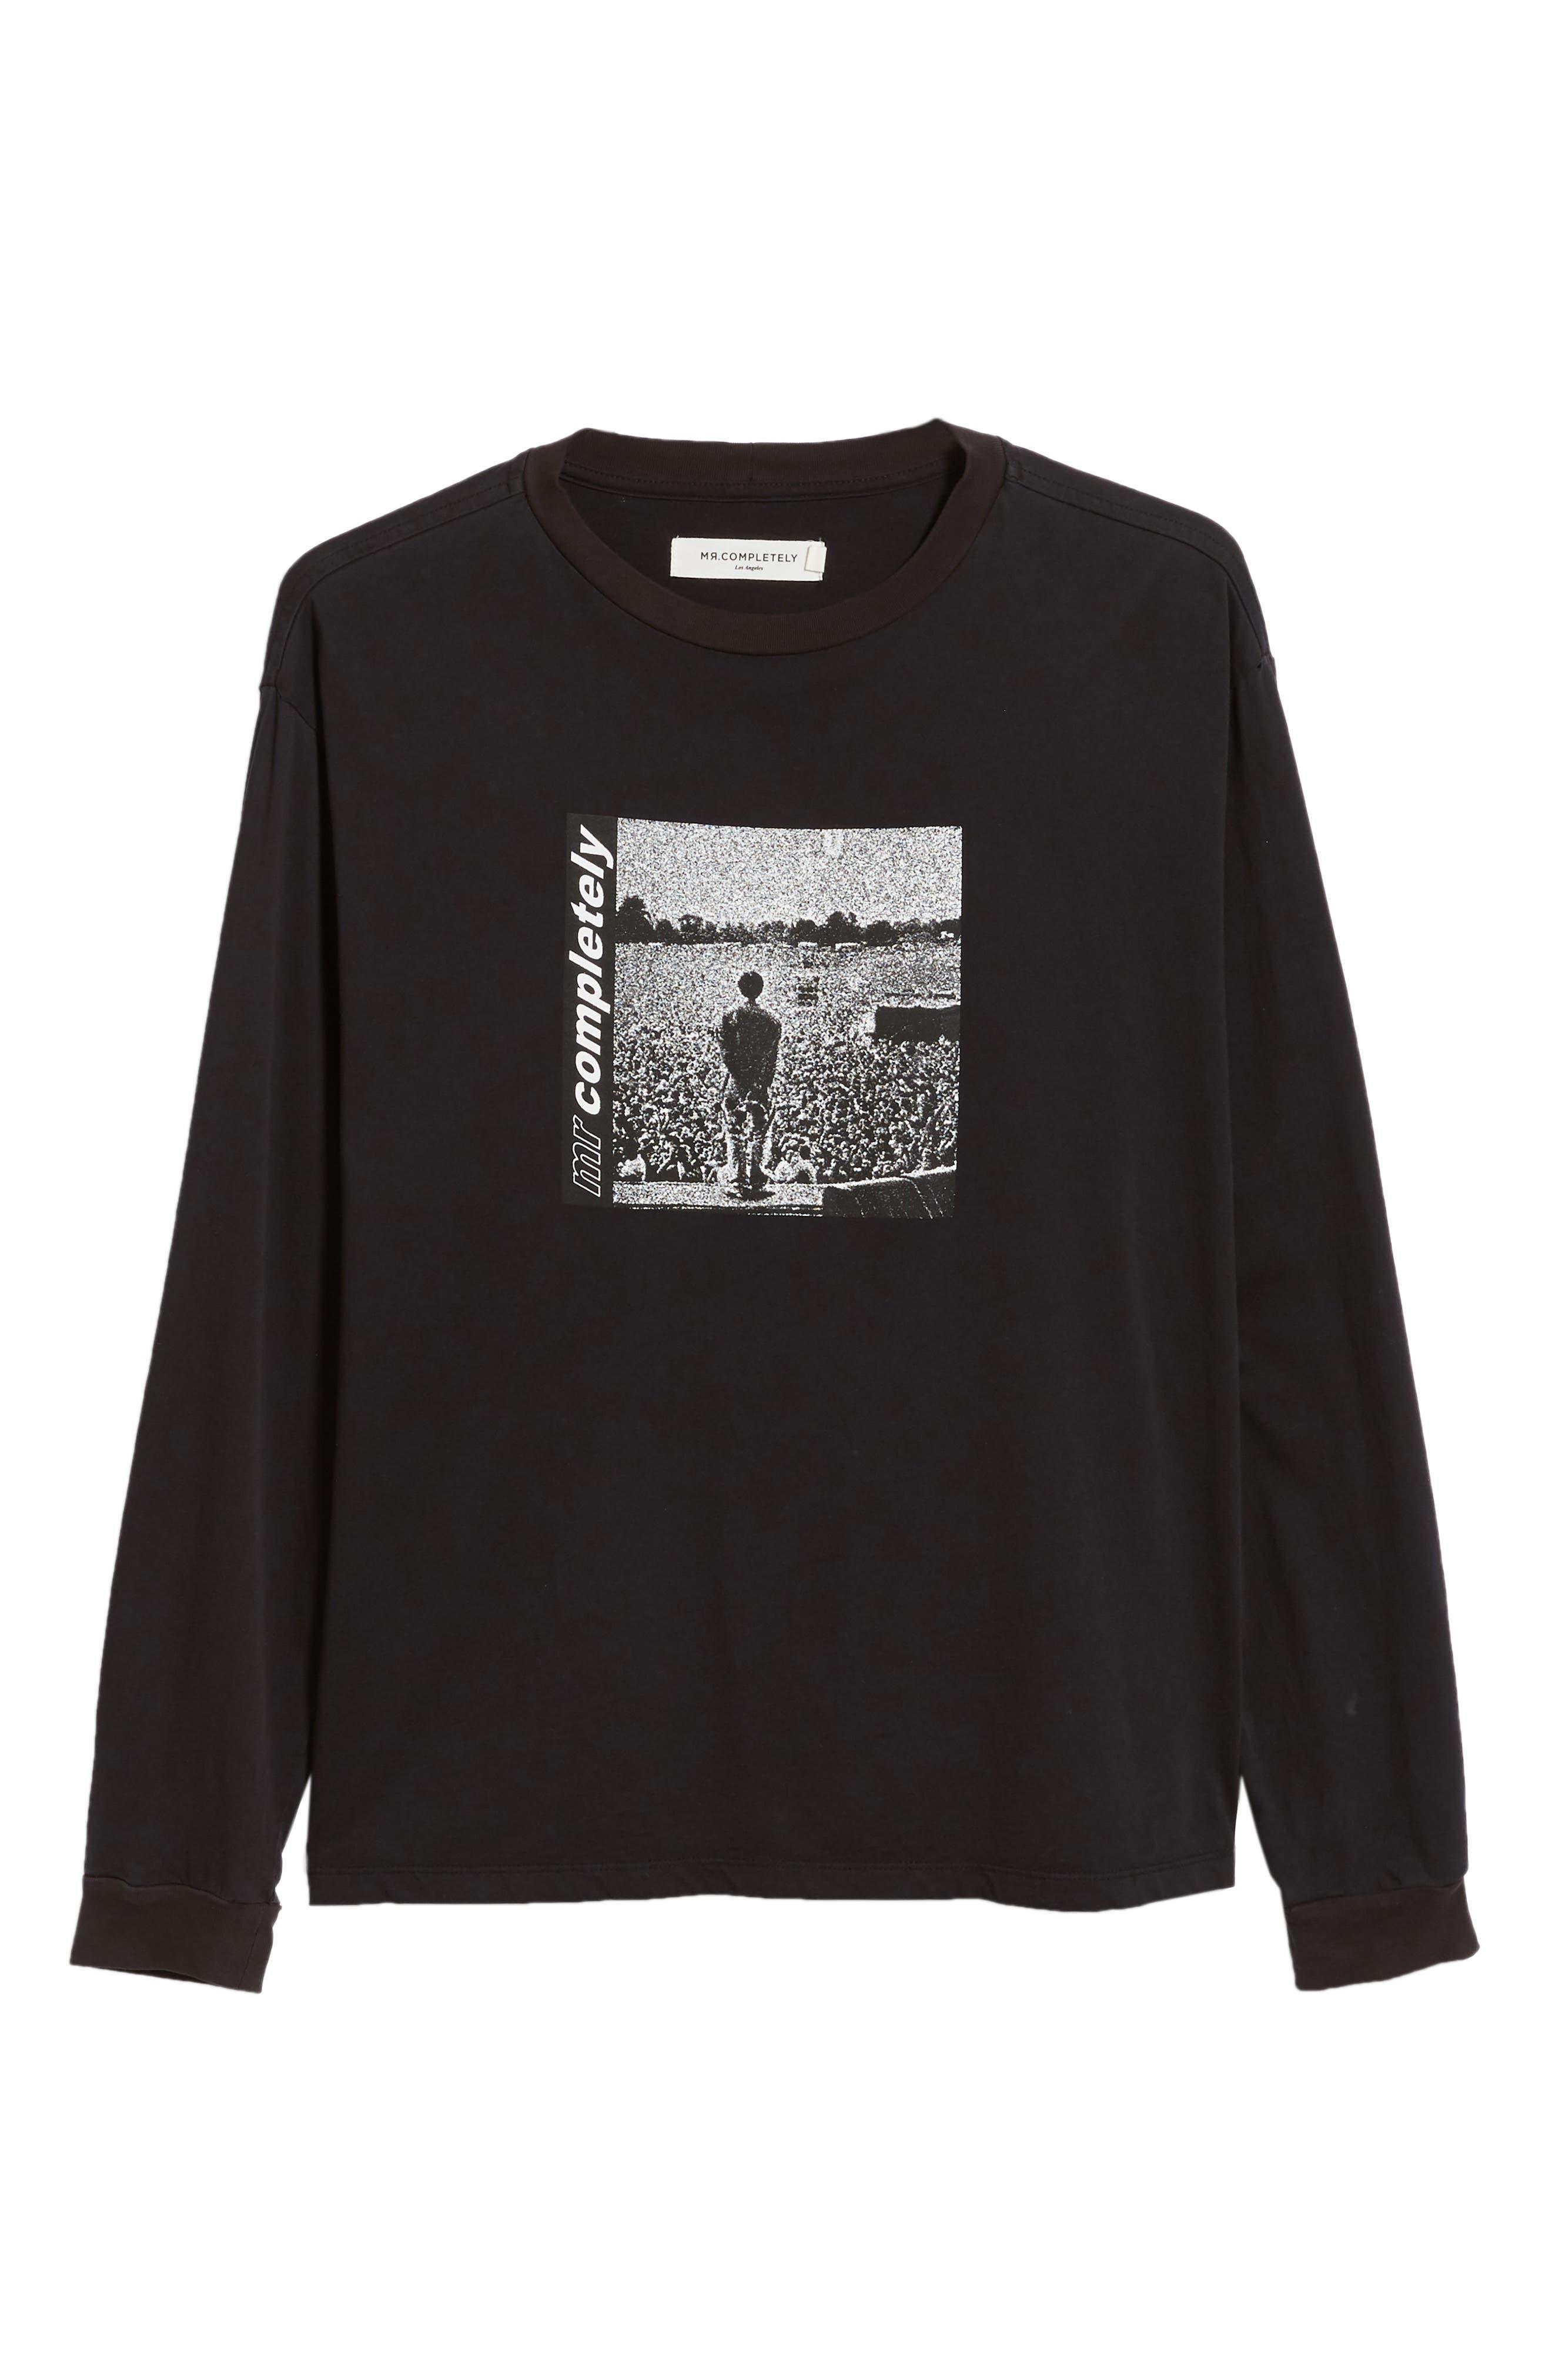 Oasis Oversize Long Sleeve T-Shirt,                             Alternate thumbnail 6, color,                             001